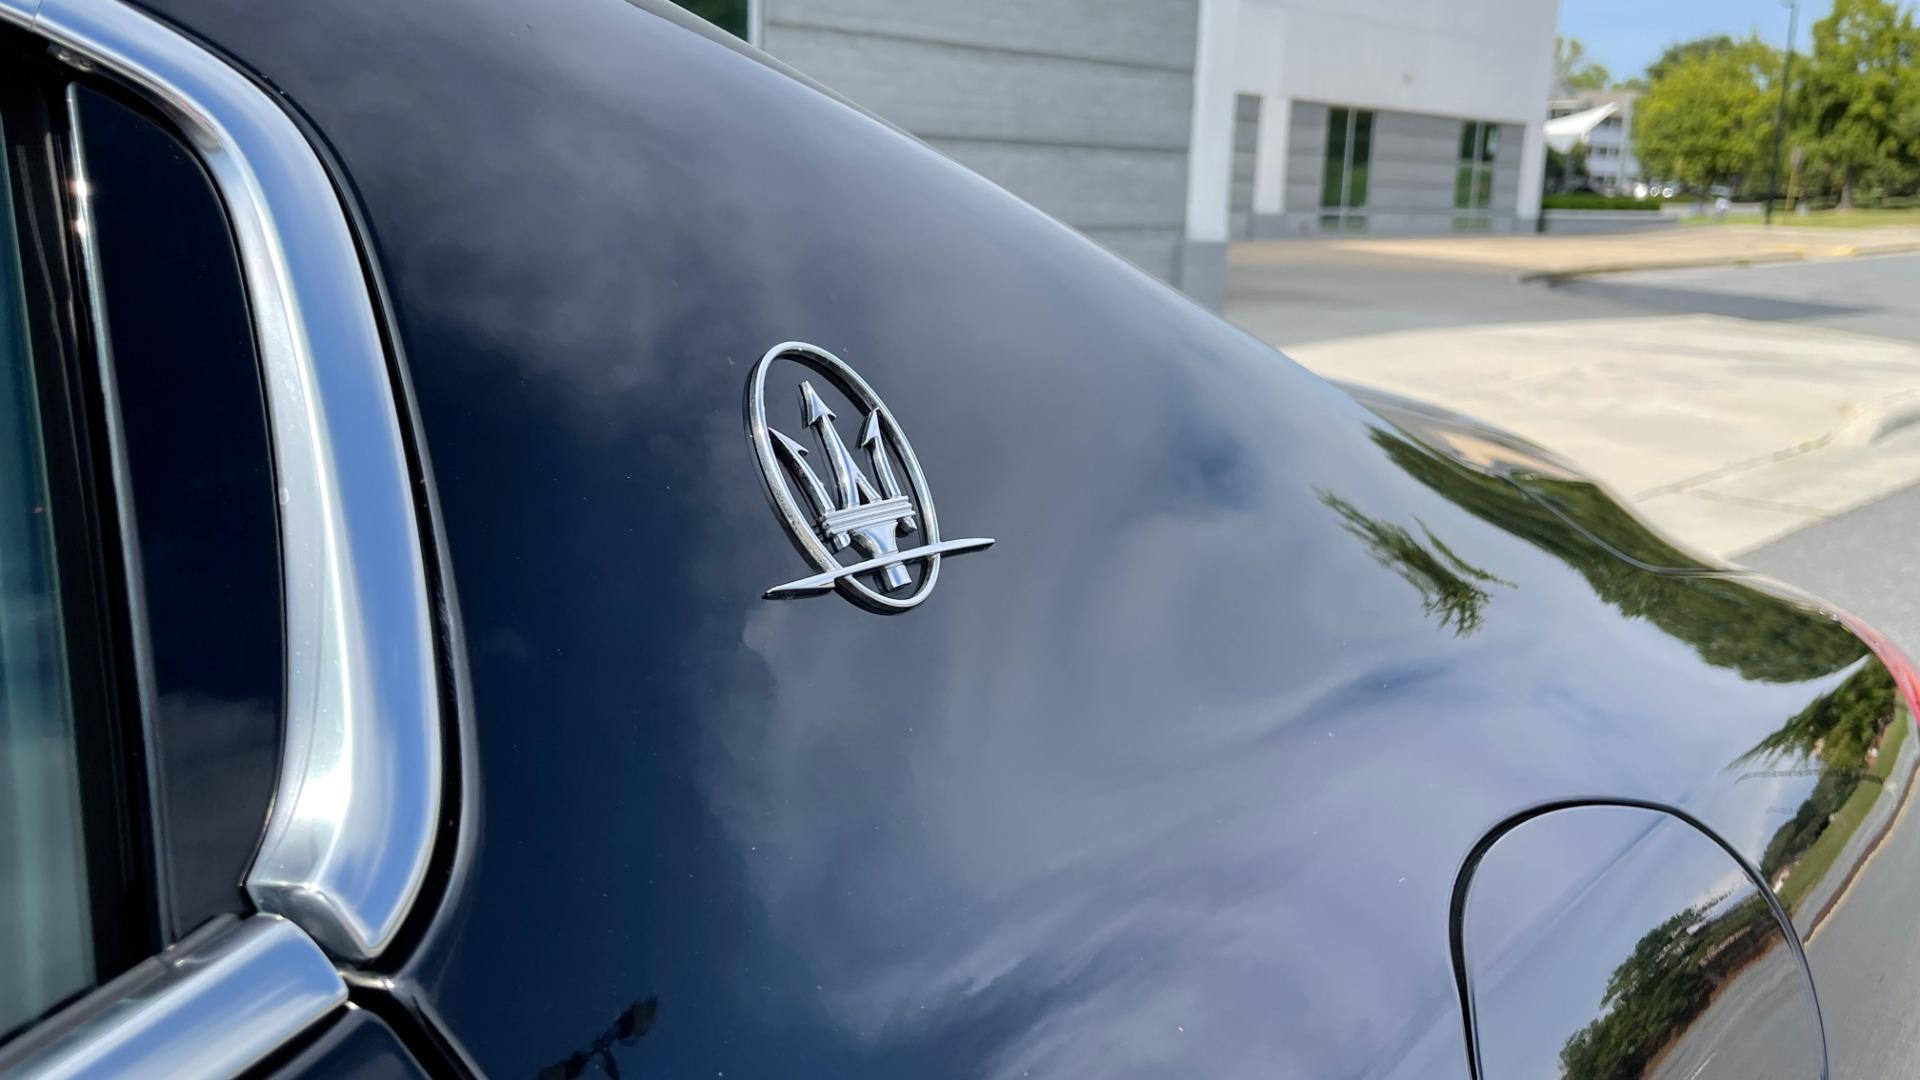 Used 2018 Maserati GHIBLI 3.0L SEDAN / 8-SPD AUTO / NAV / SUNROOF / REARVIEW for sale $42,995 at Formula Imports in Charlotte NC 28227 10